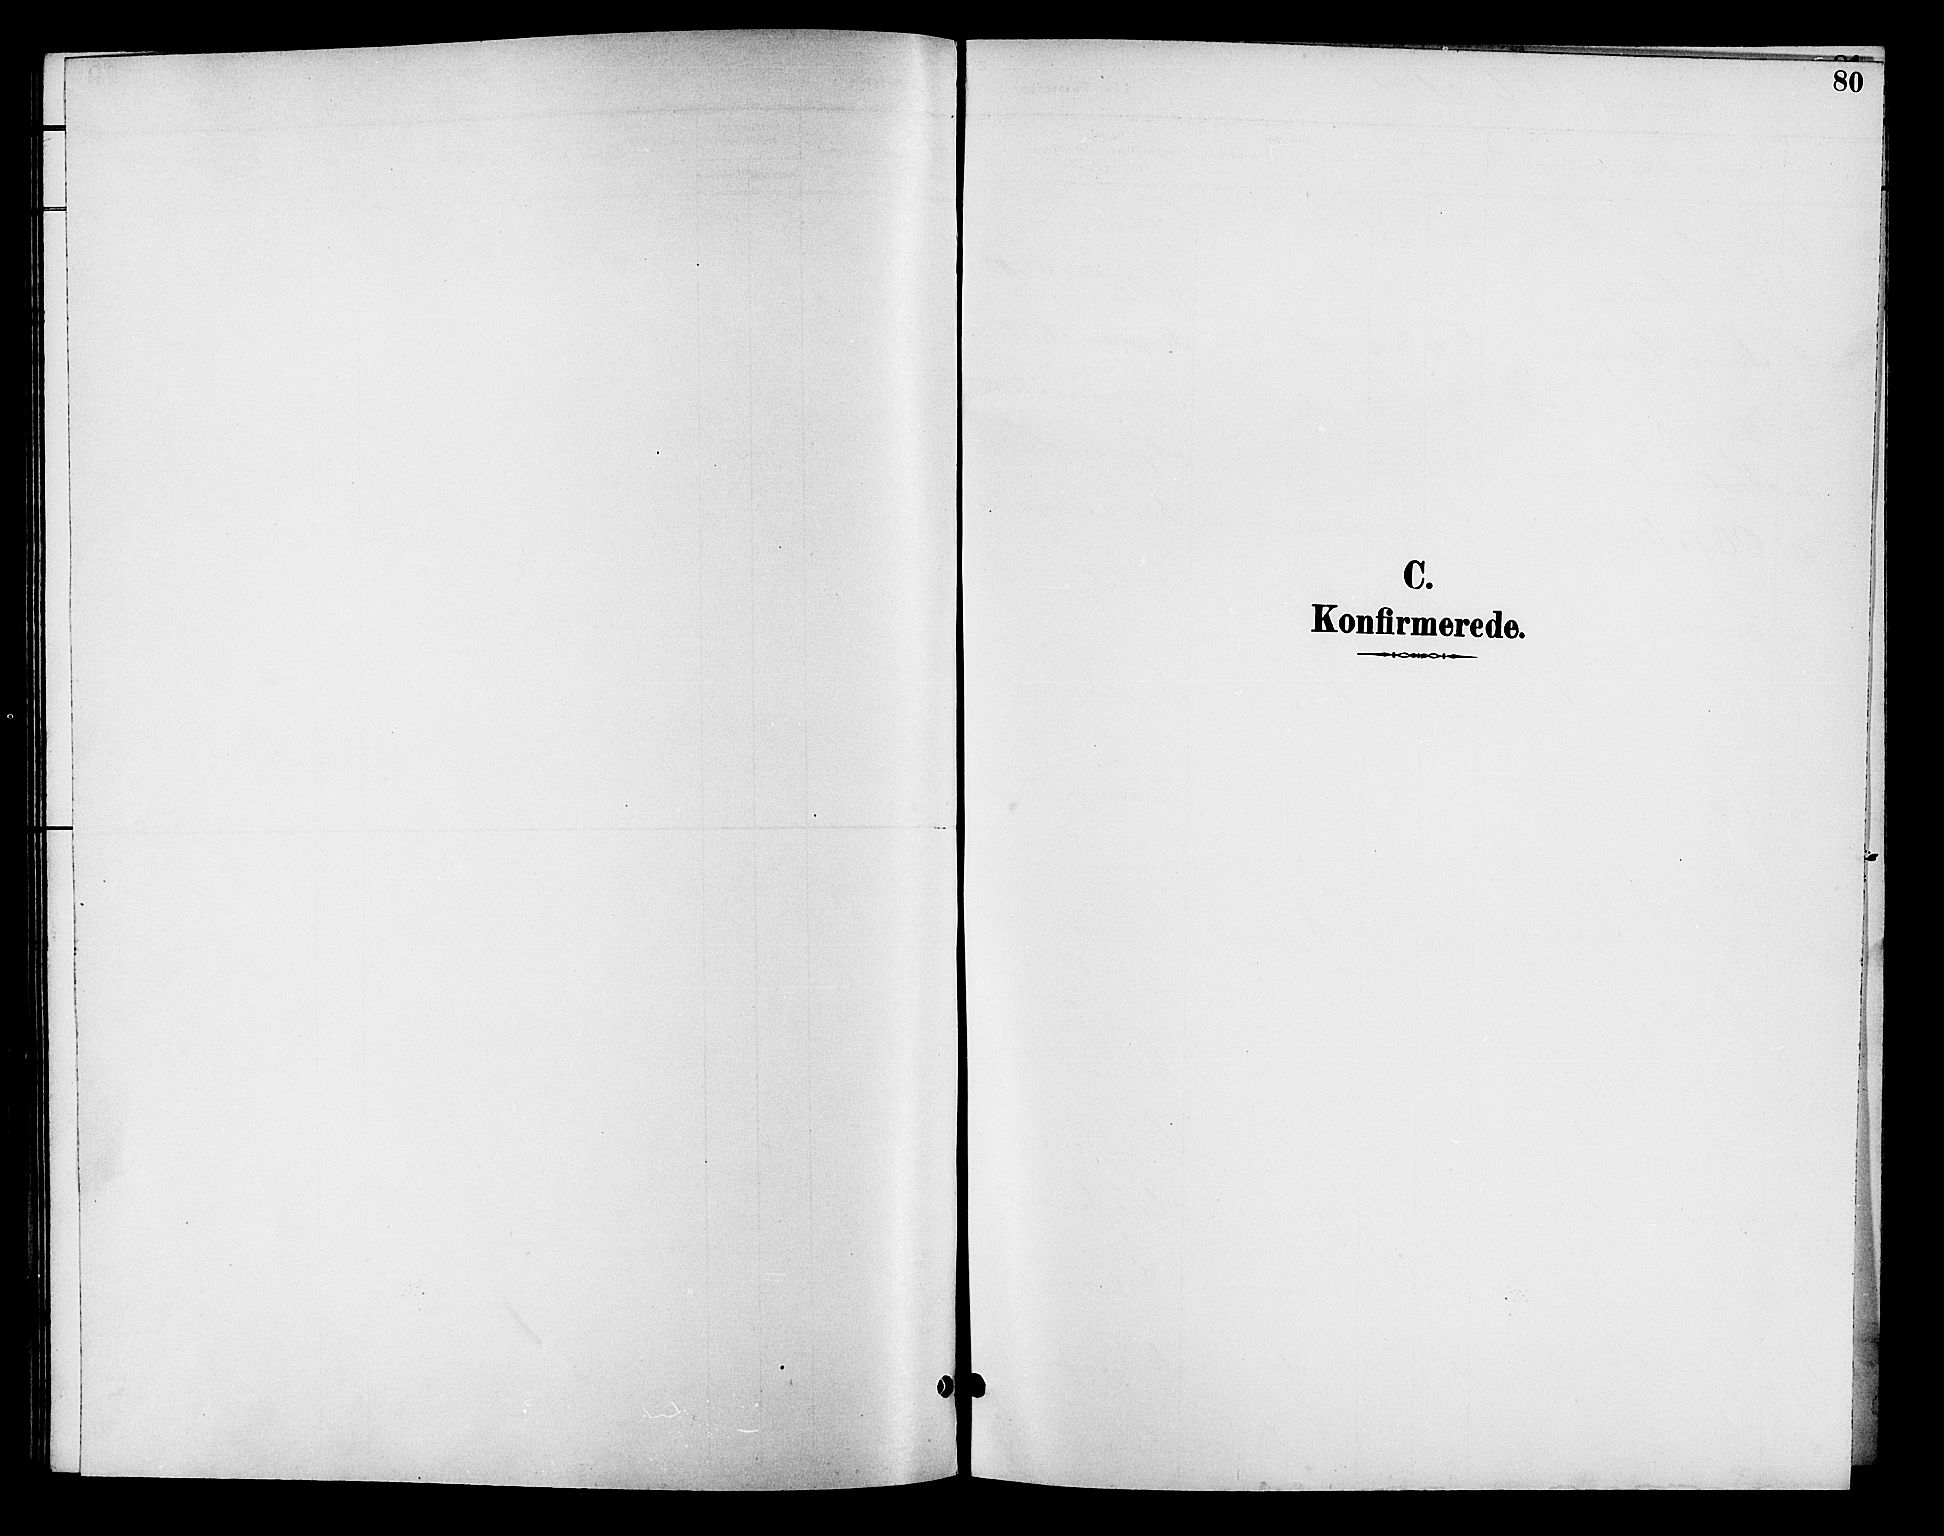 SAH, Fåberg prestekontor, Klokkerbok nr. 8, 1891-1900, s. 80